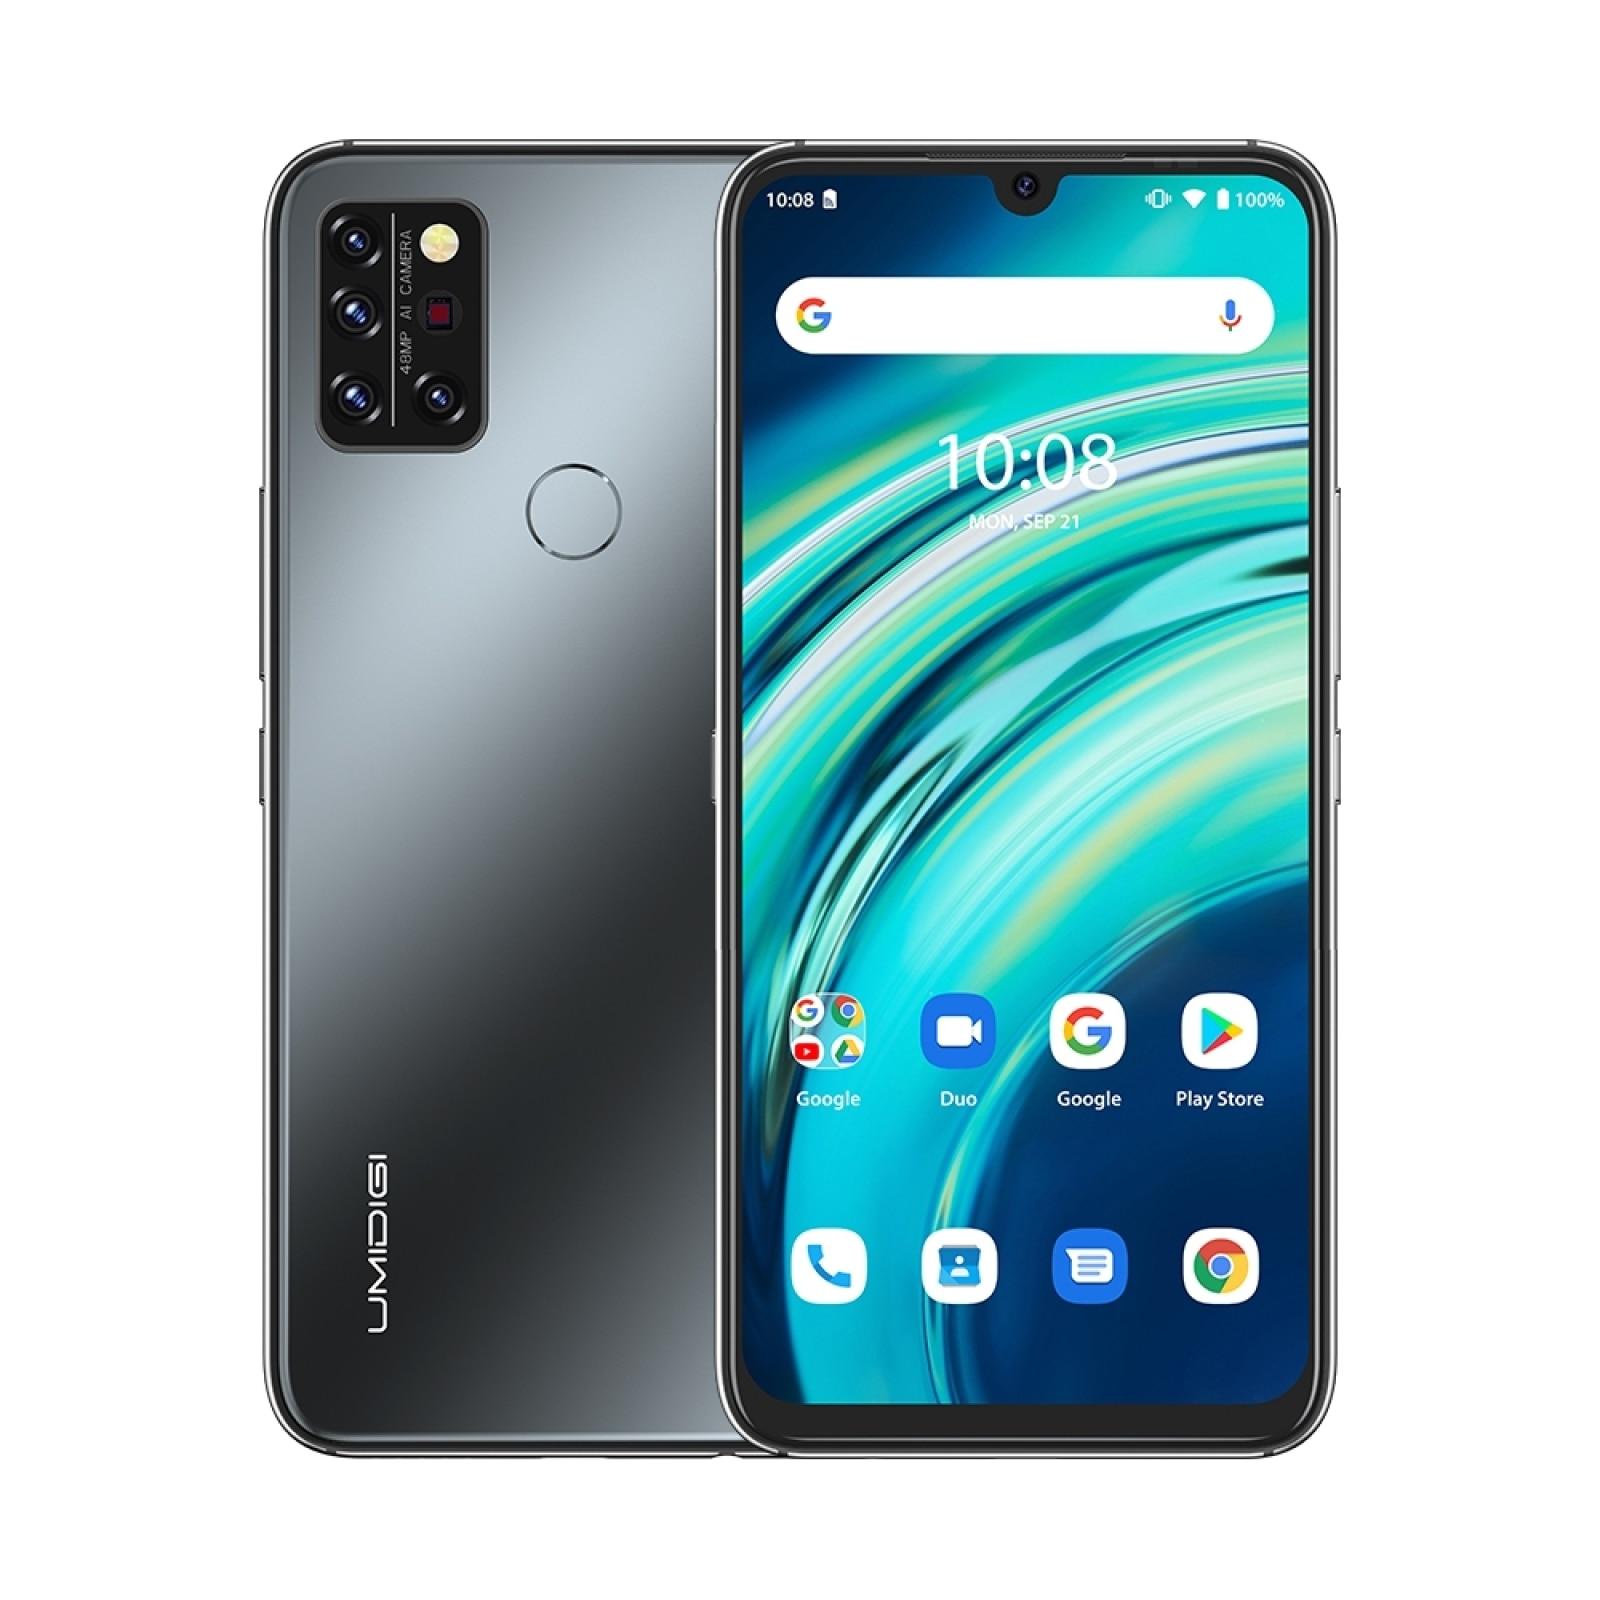 UMIDIGI A9 Pro 48MP Quad Camera Smartphone 6+128GB Android 10 Helio P60 Octa Core 6.3